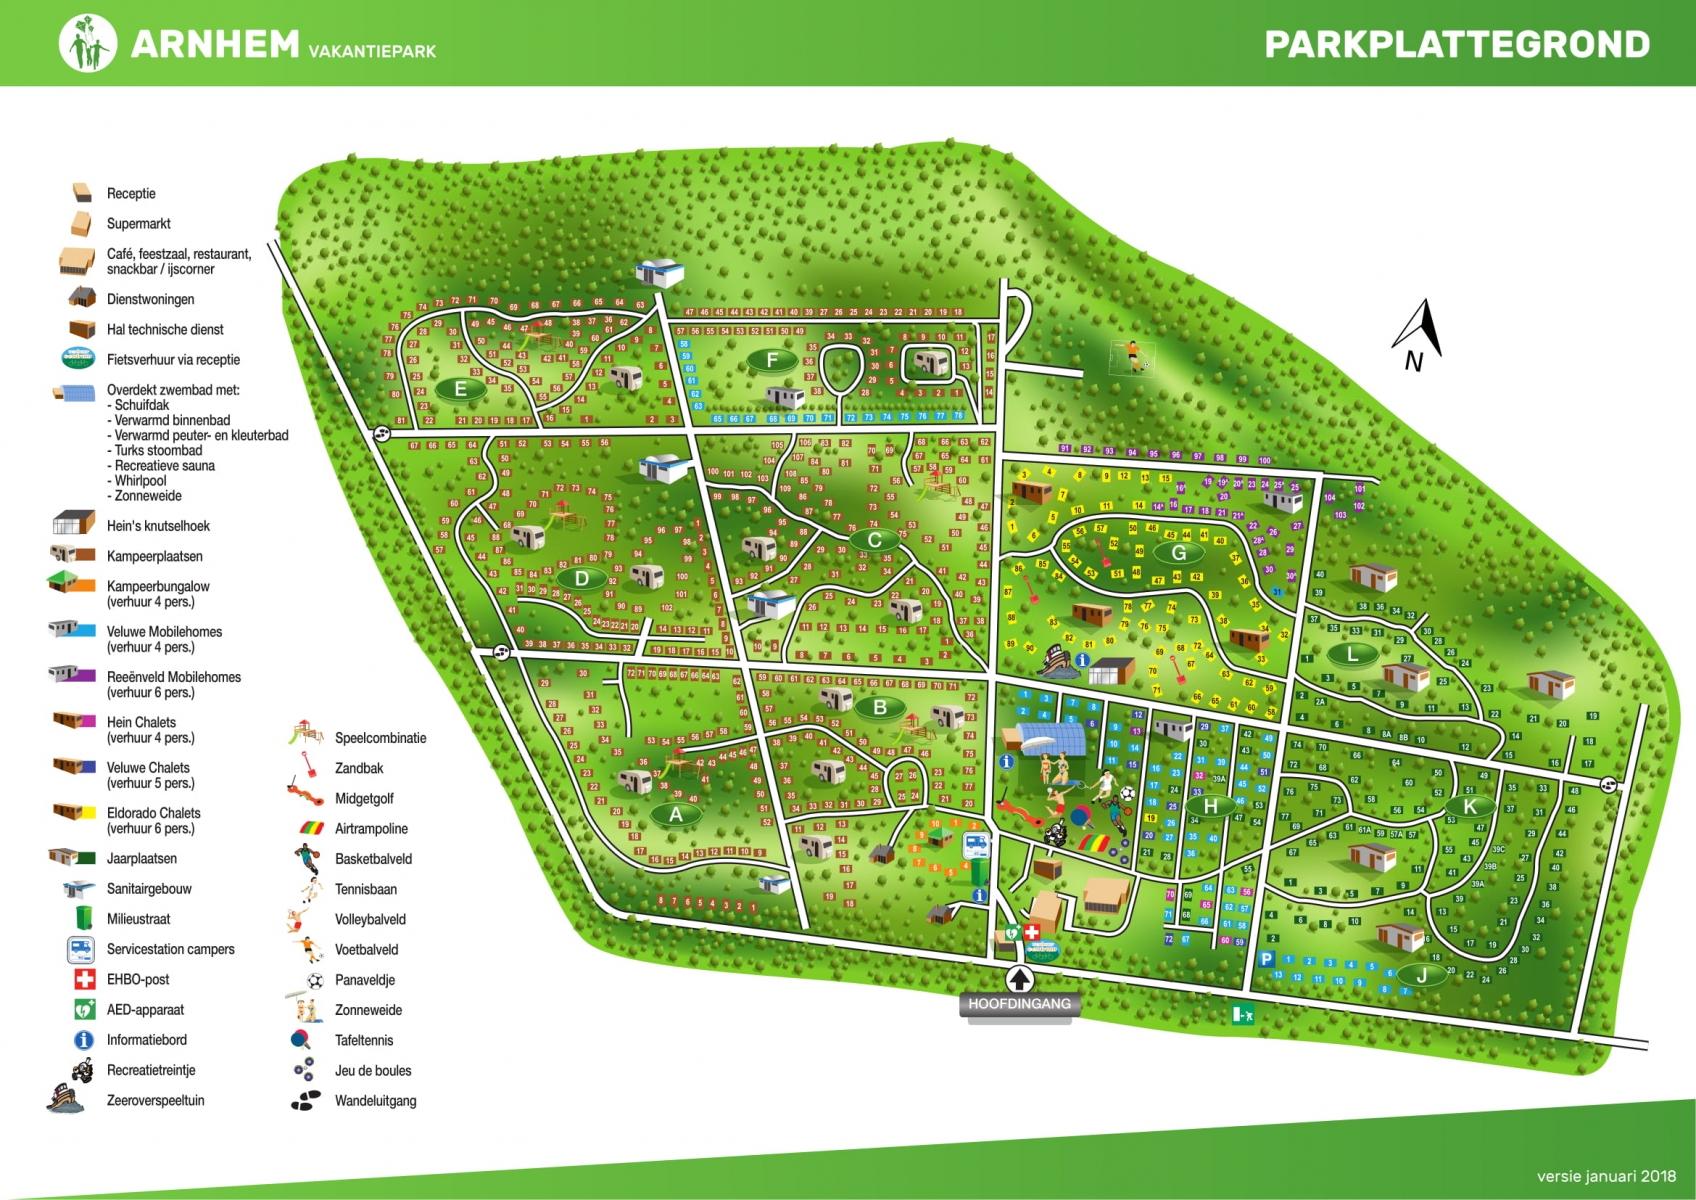 Vakantiepark Arnhem